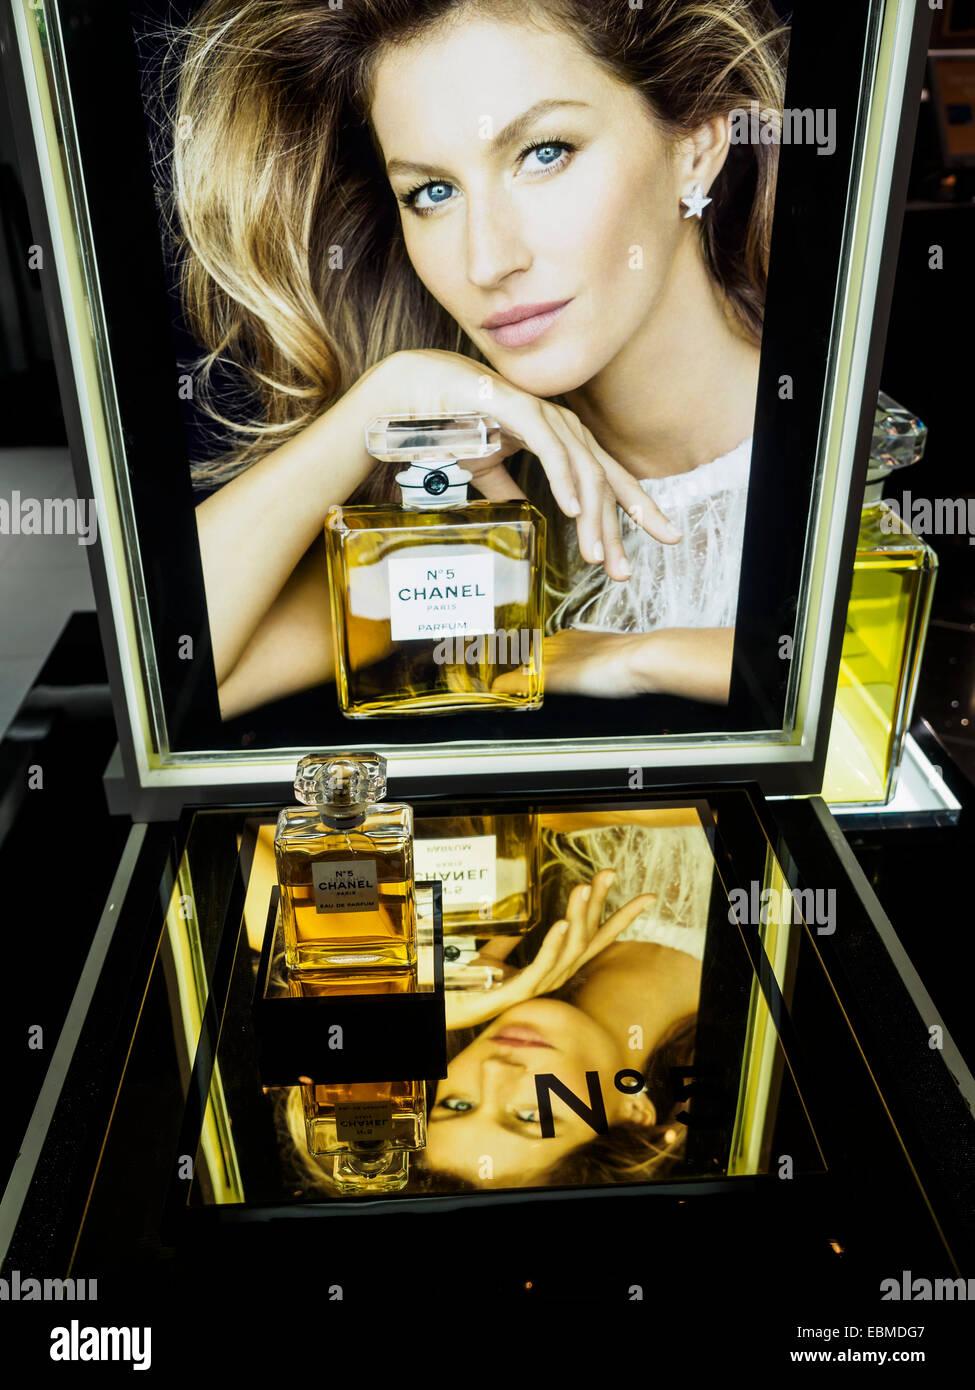 Chanel No 5 Perfume Bottle Ad With Gisele Bundchen Stock